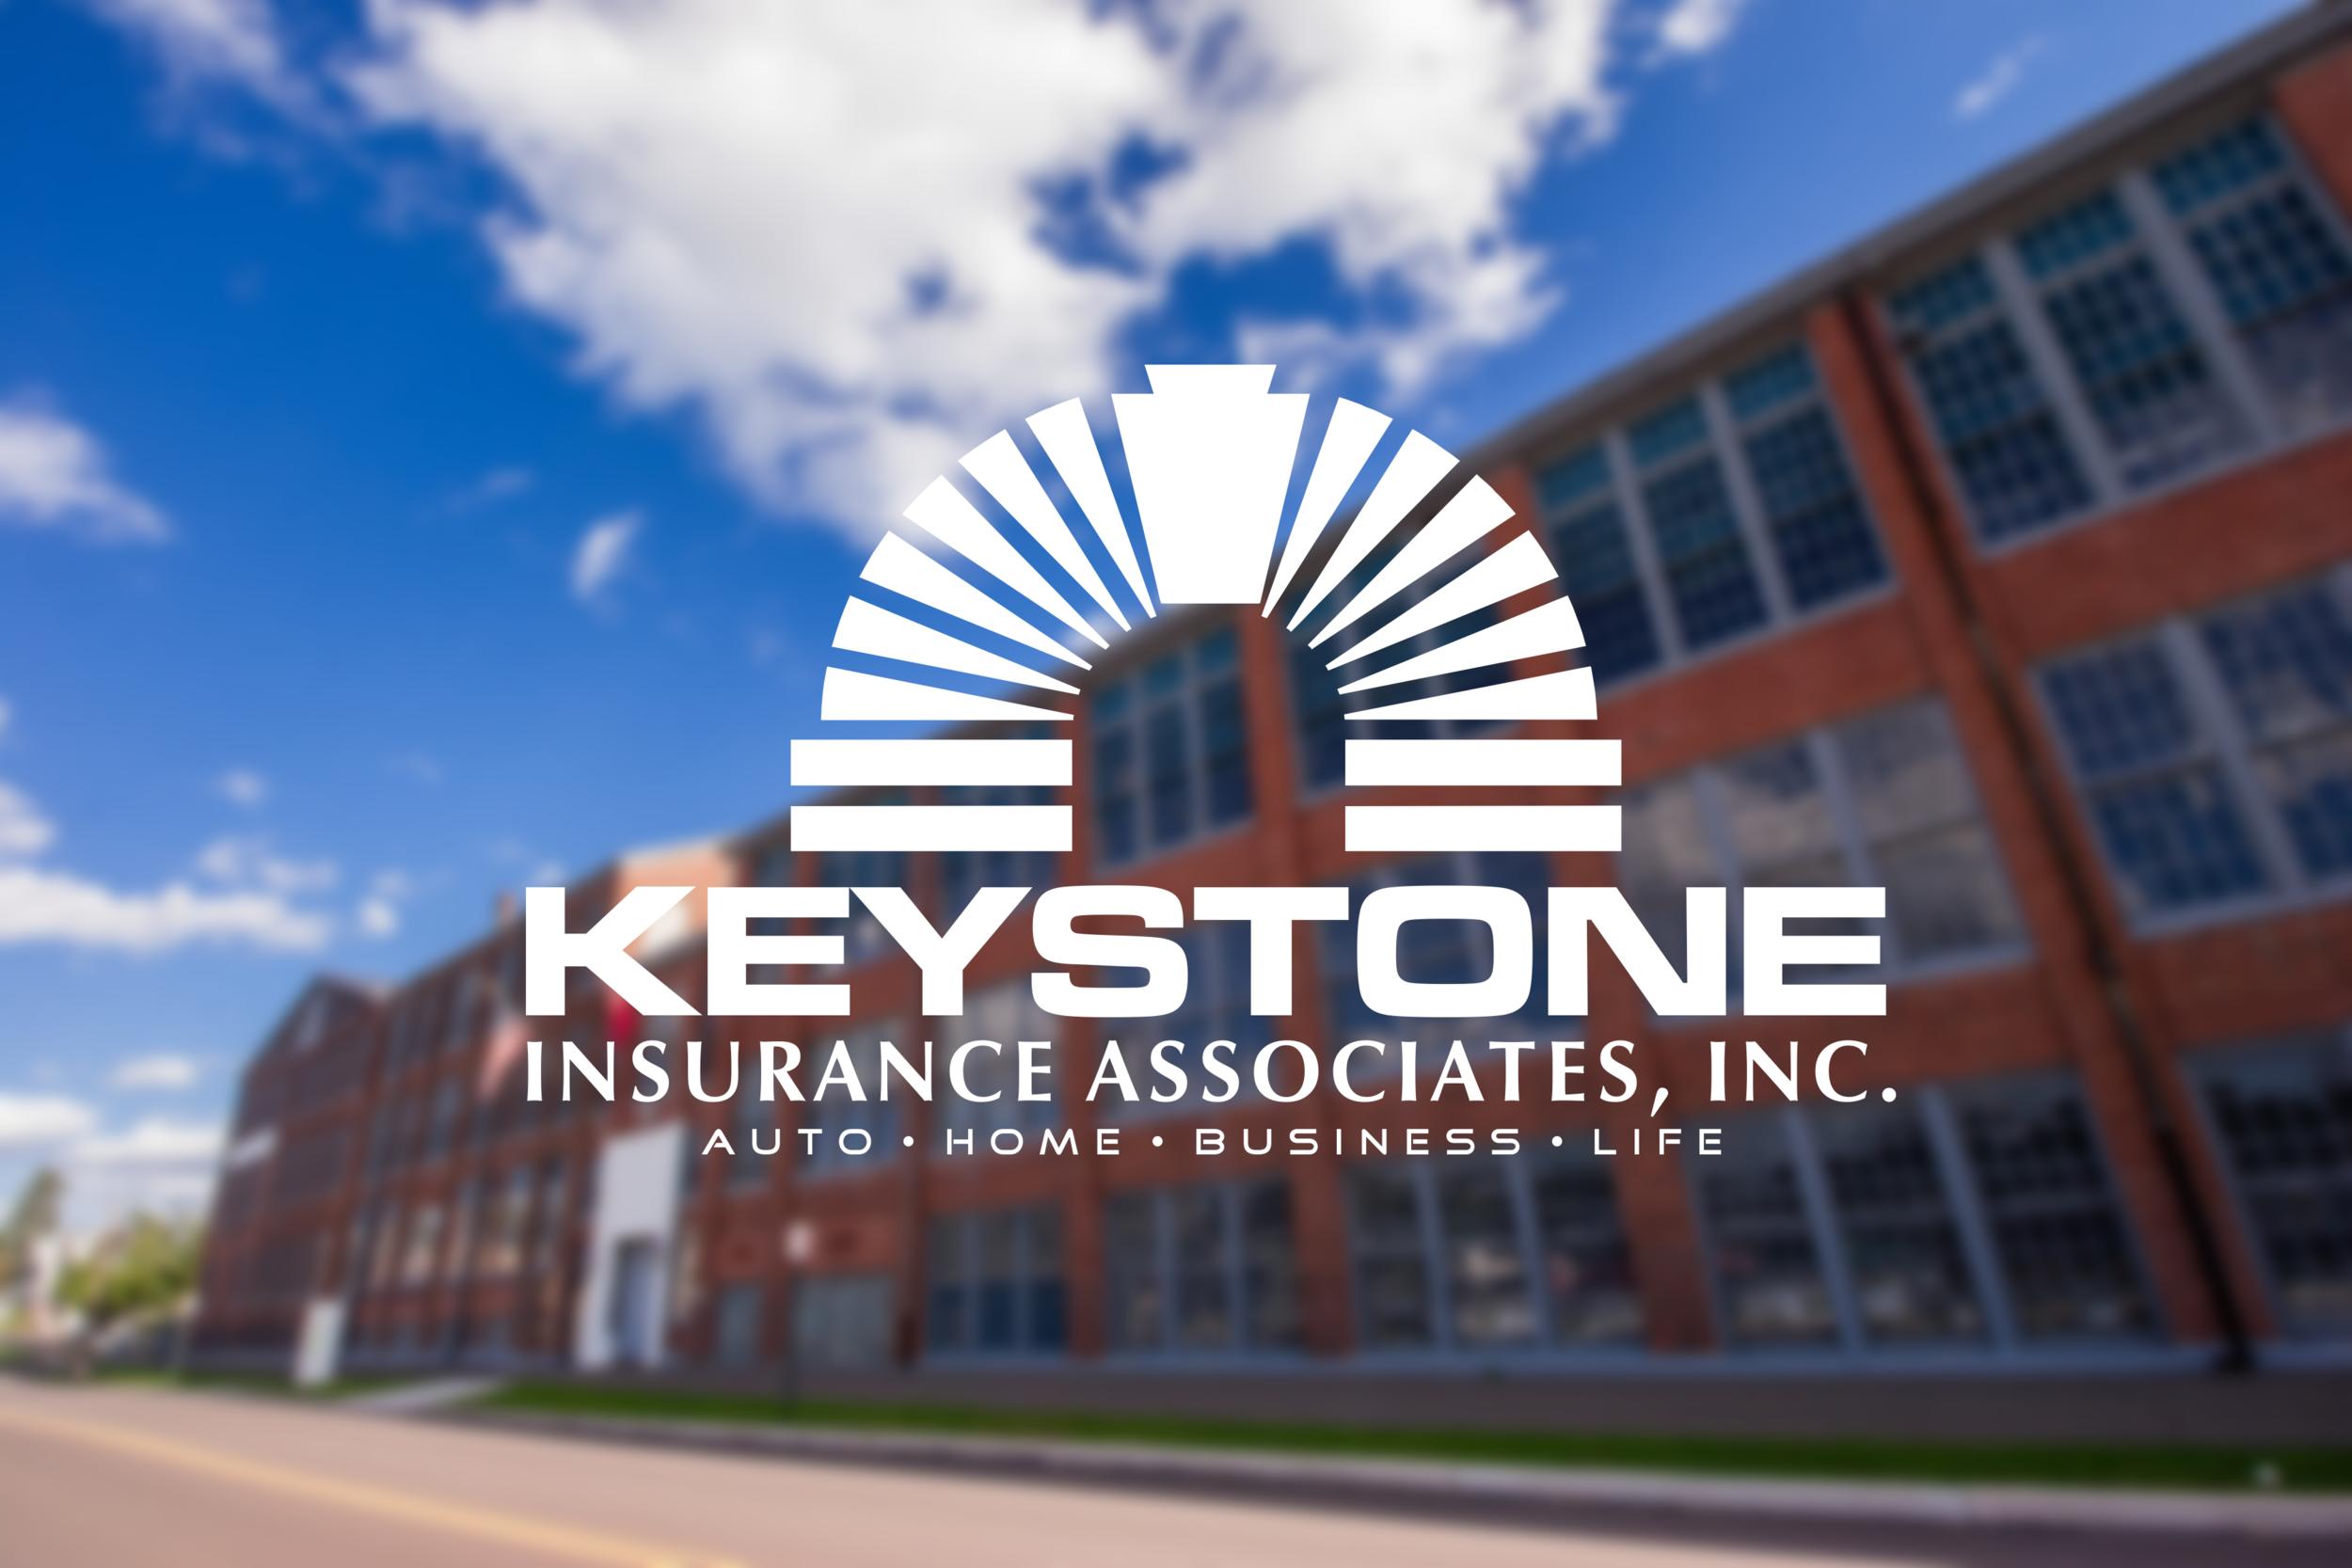 Keystone Insurance Associates - Contact